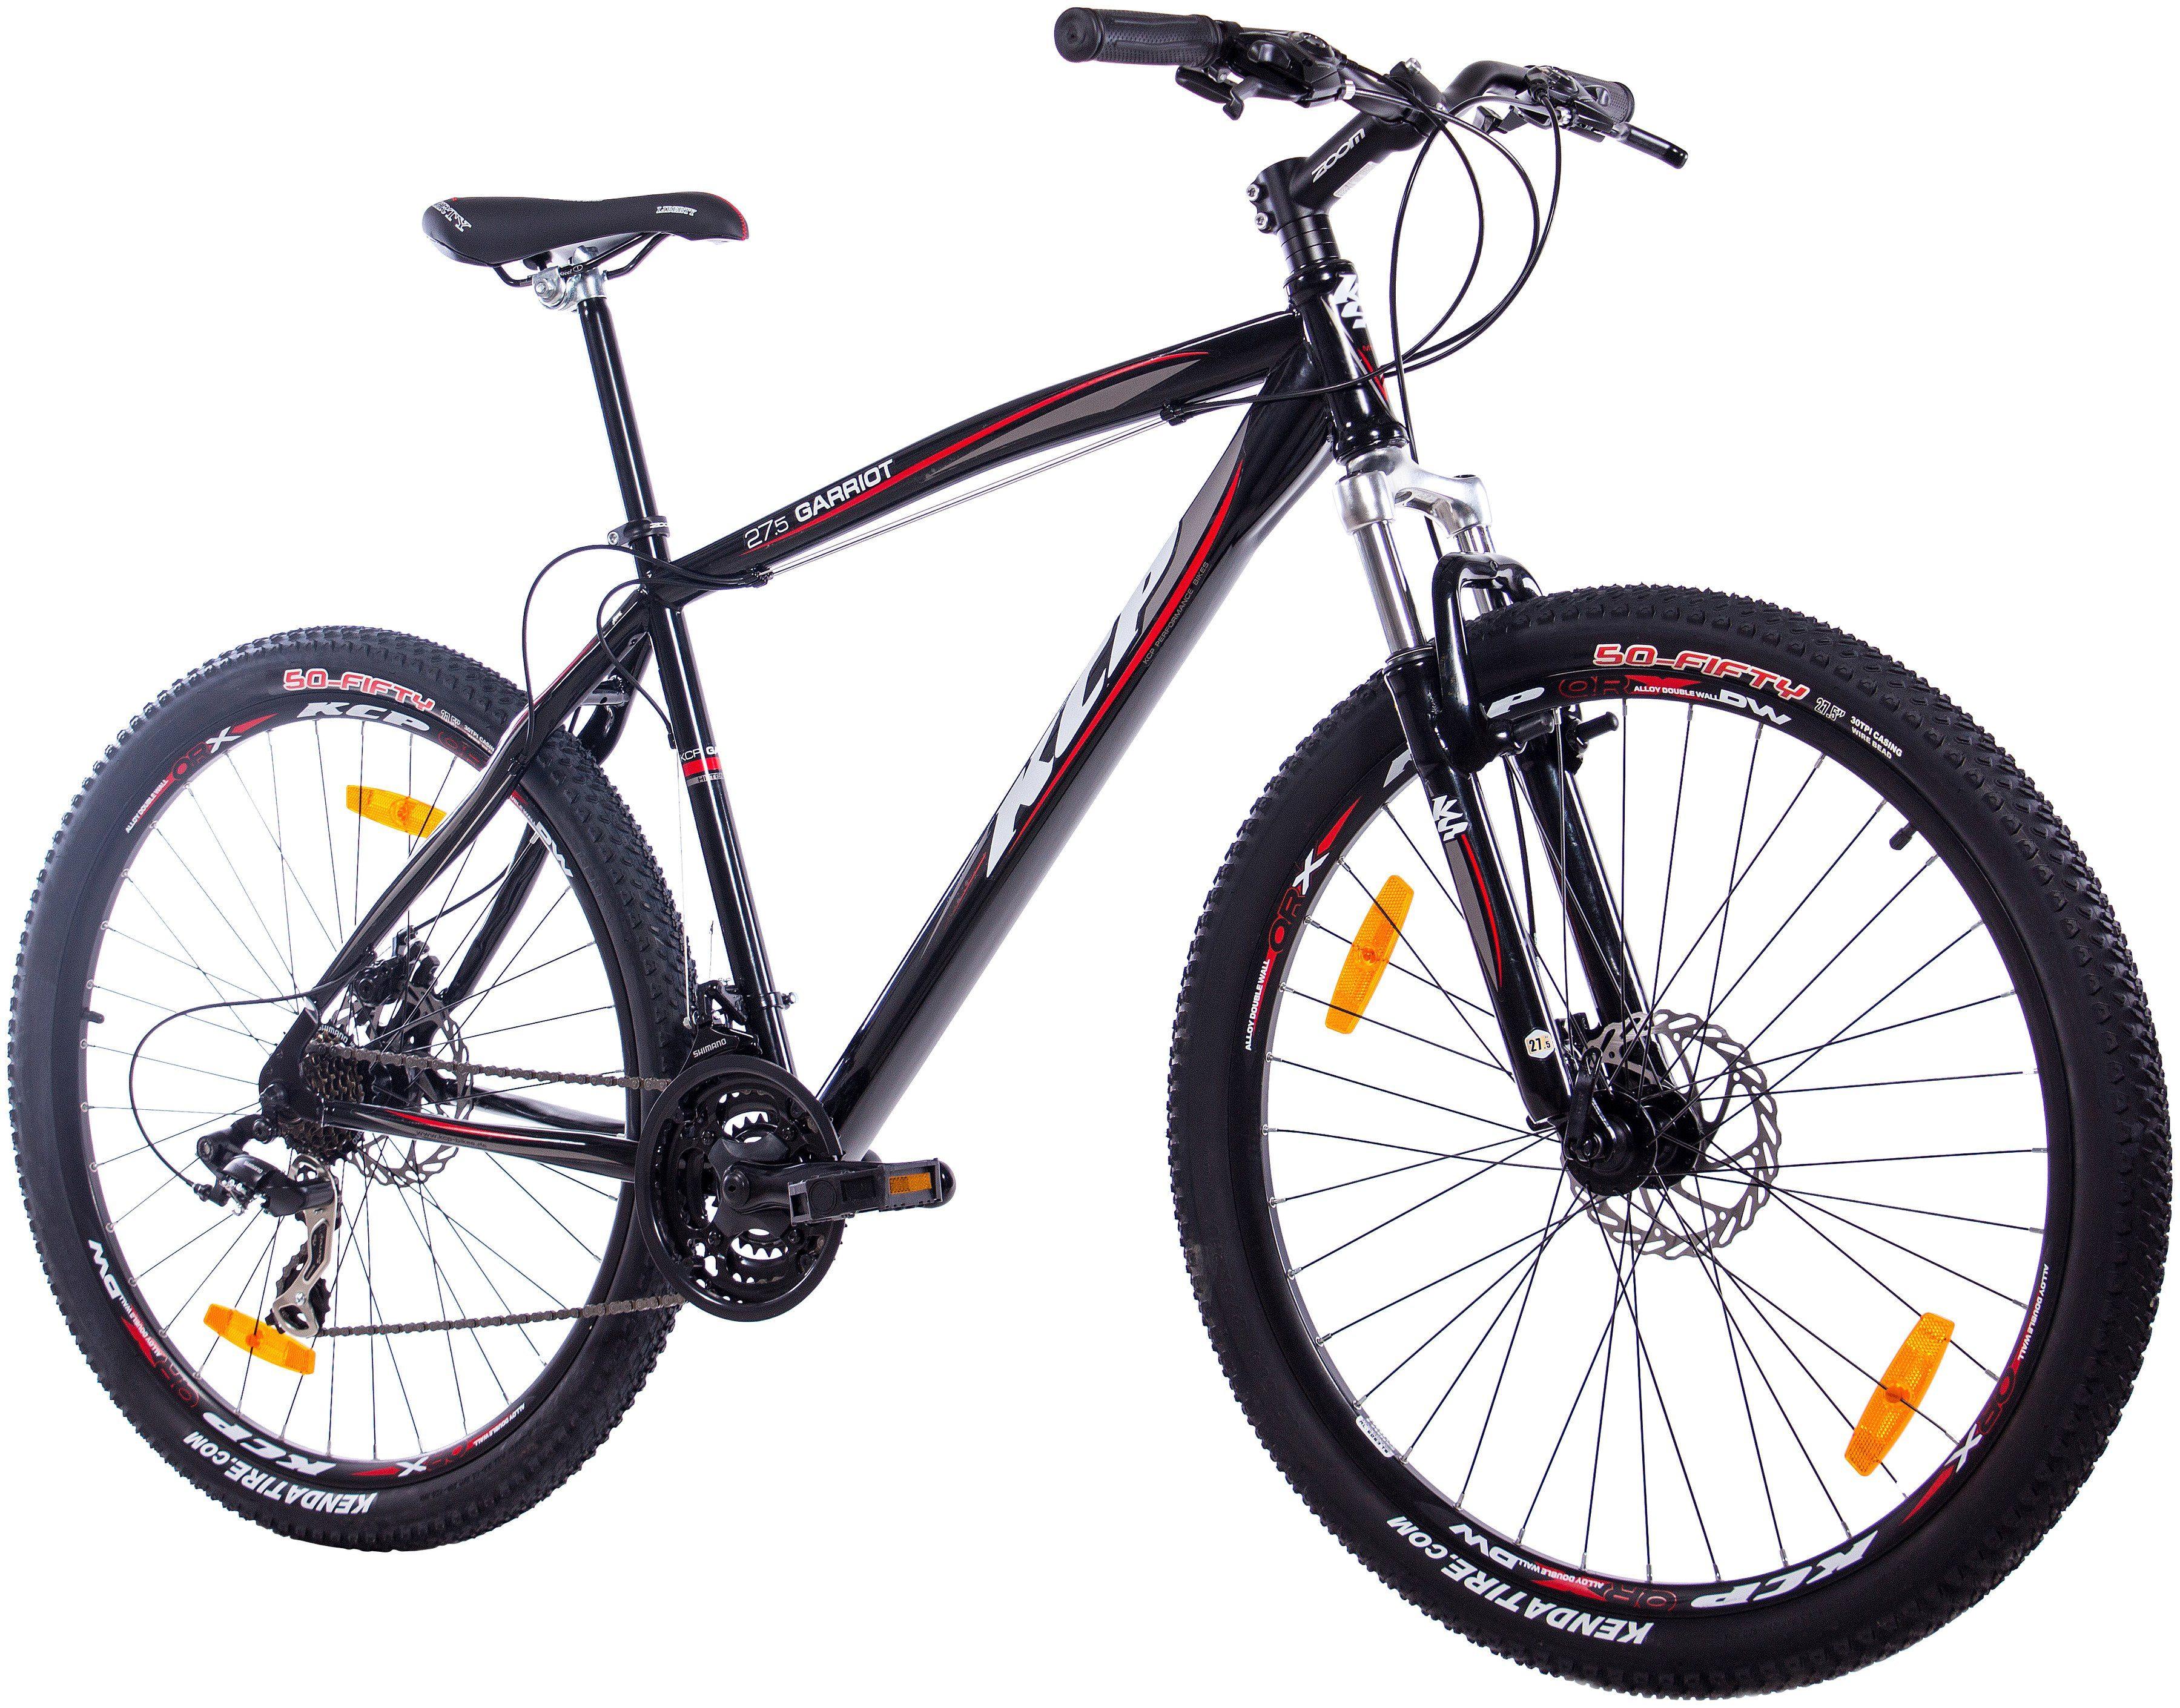 Mountainbike »GARRIOT schwarz, 70 cm (27,5 Zoll), Rahmenhöhe: 48 cm«